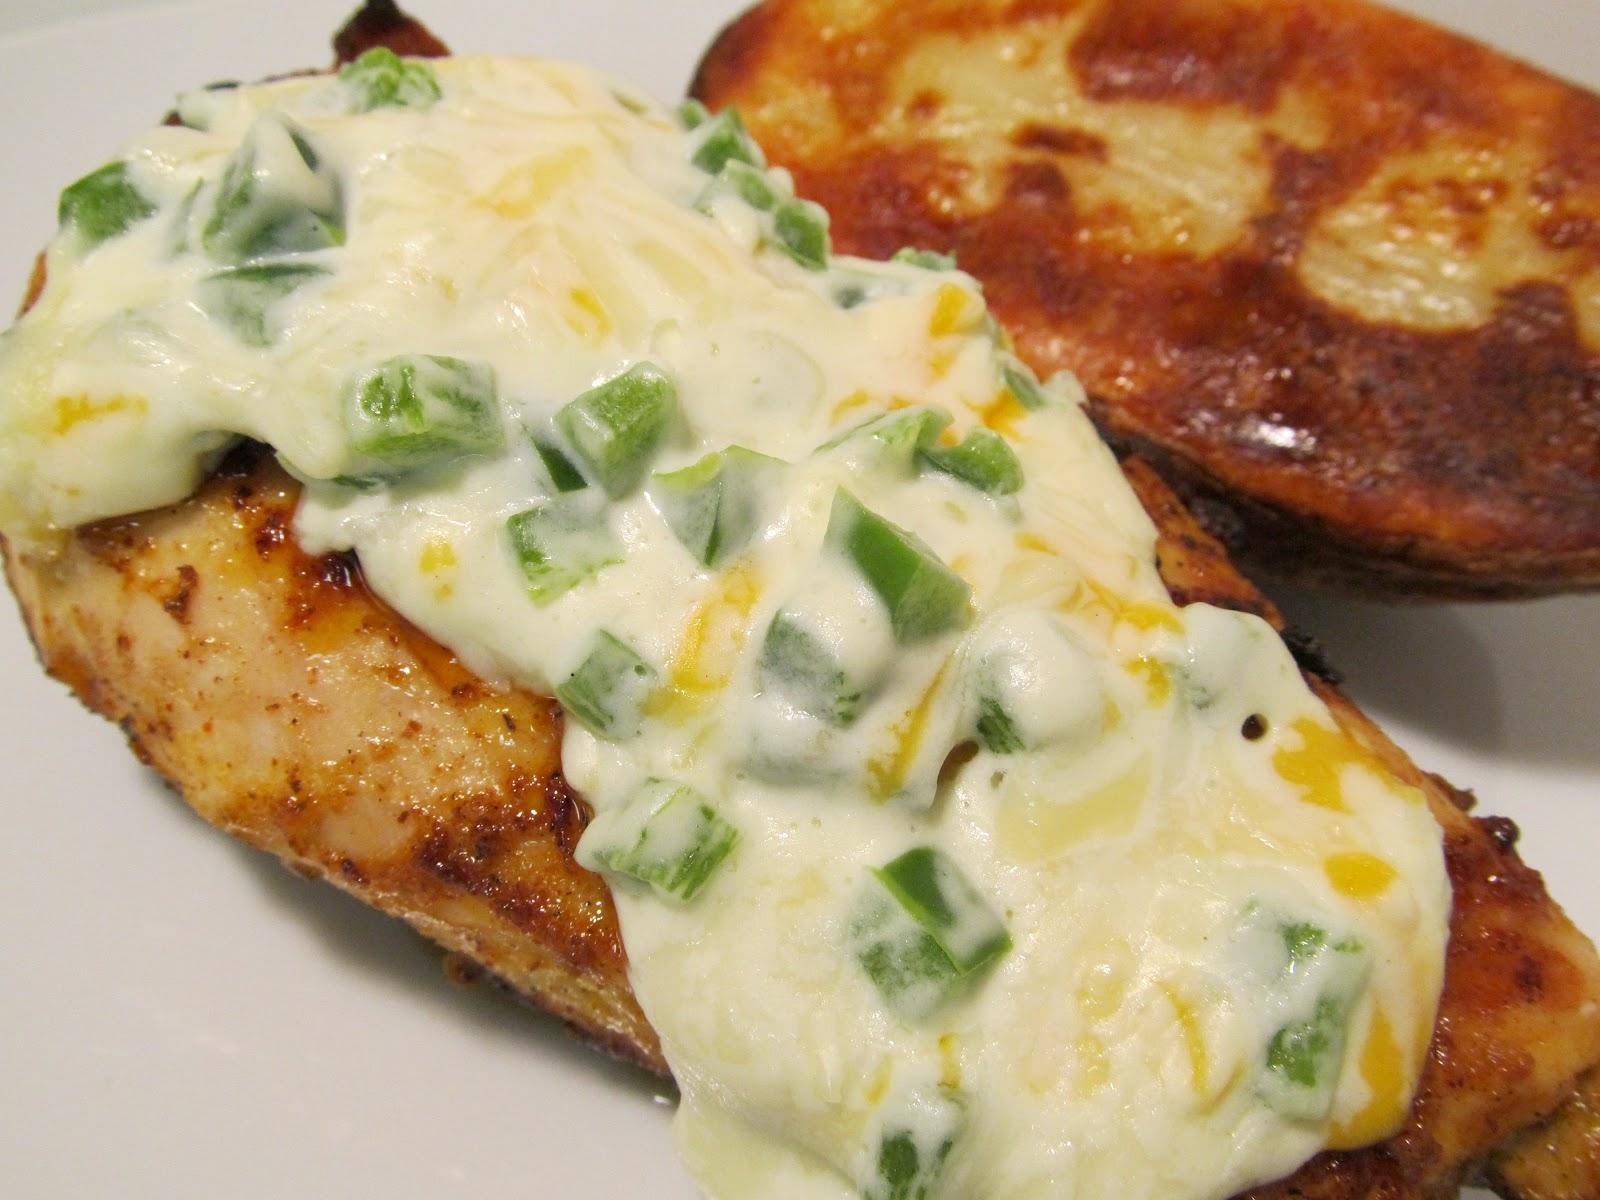 Jenn's Food Journey: Grilled Jalapeno Popper Topped Chicken